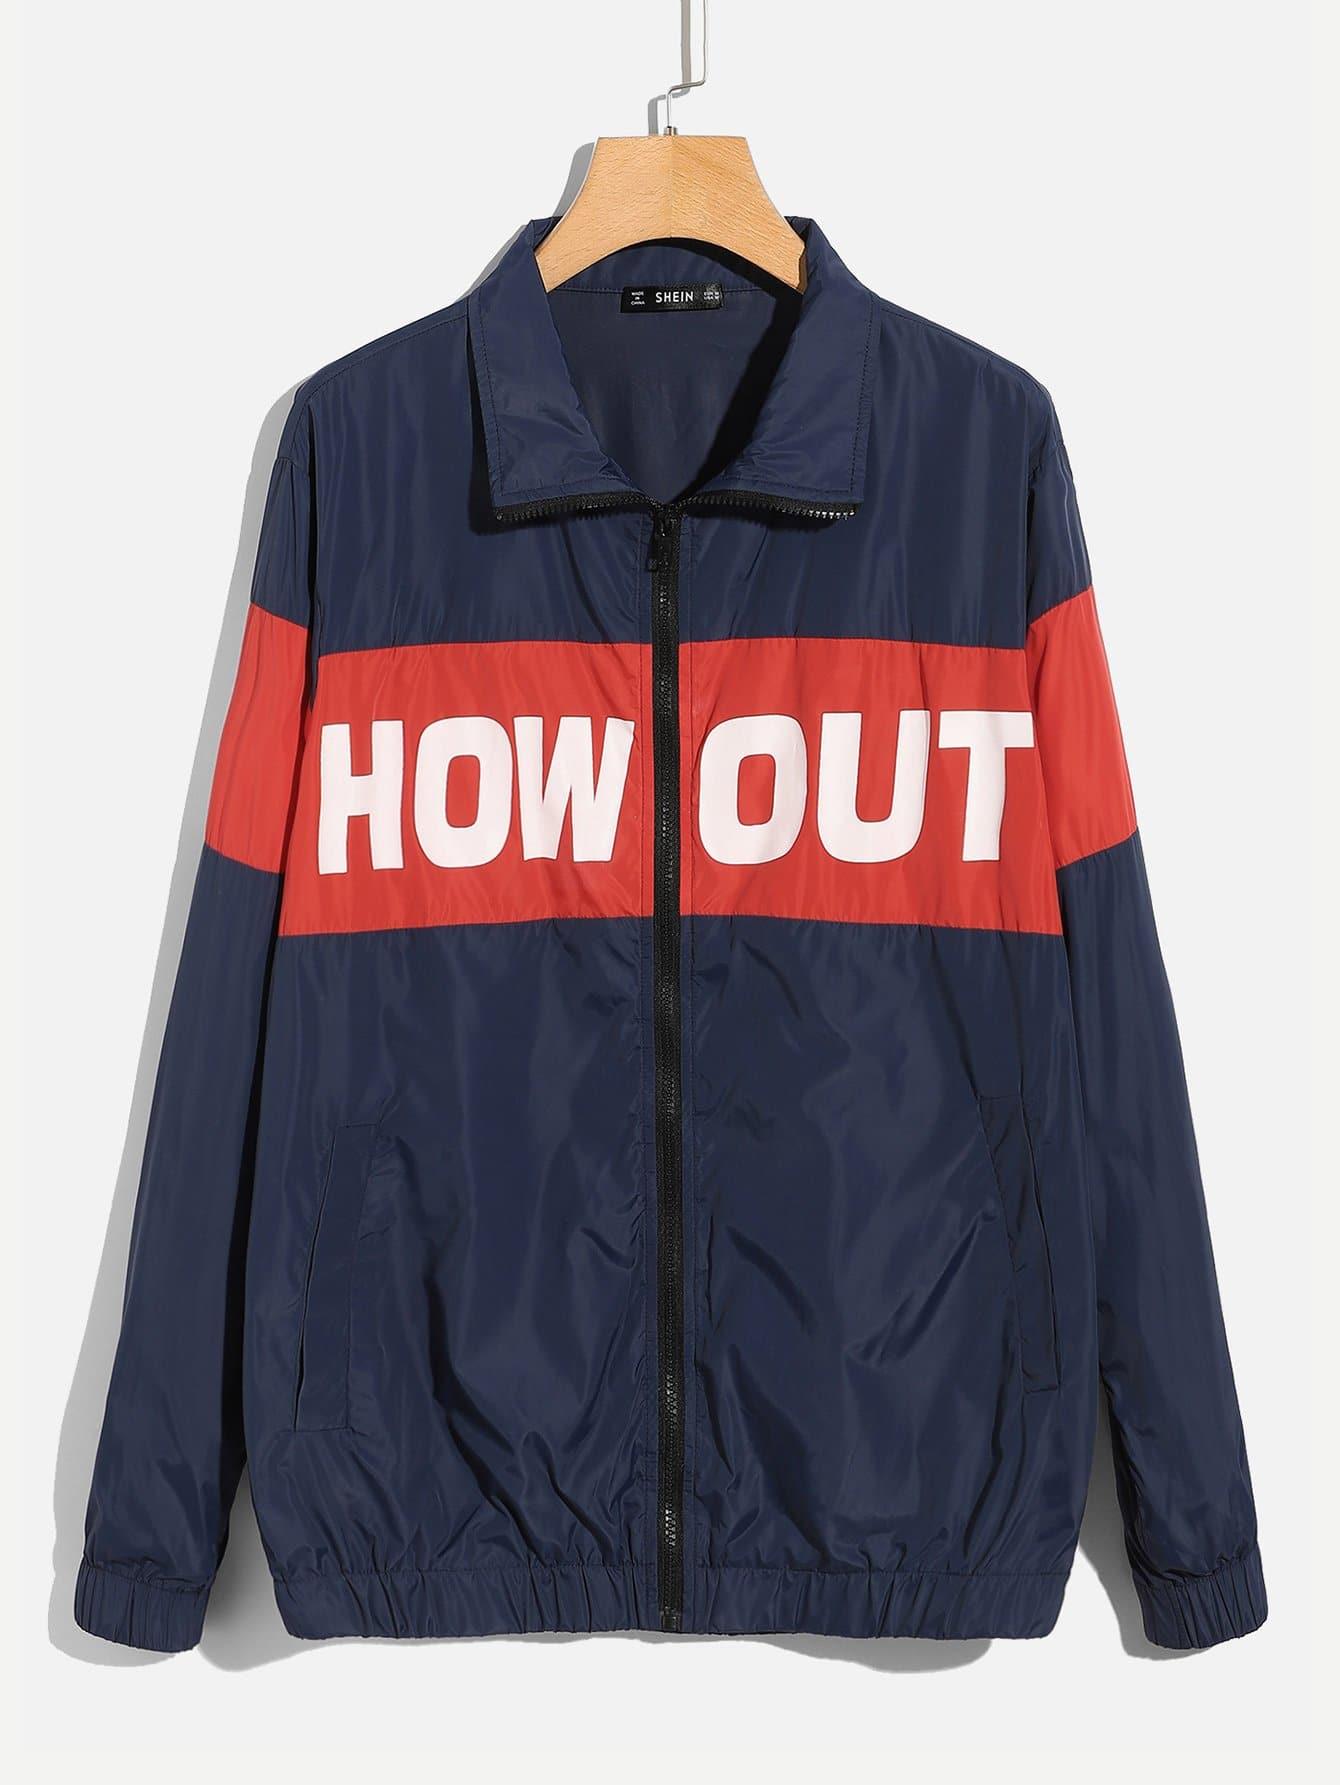 Фото - Для мужчин куртка на молнии с текстовым принтом от SheIn цвет темно синий